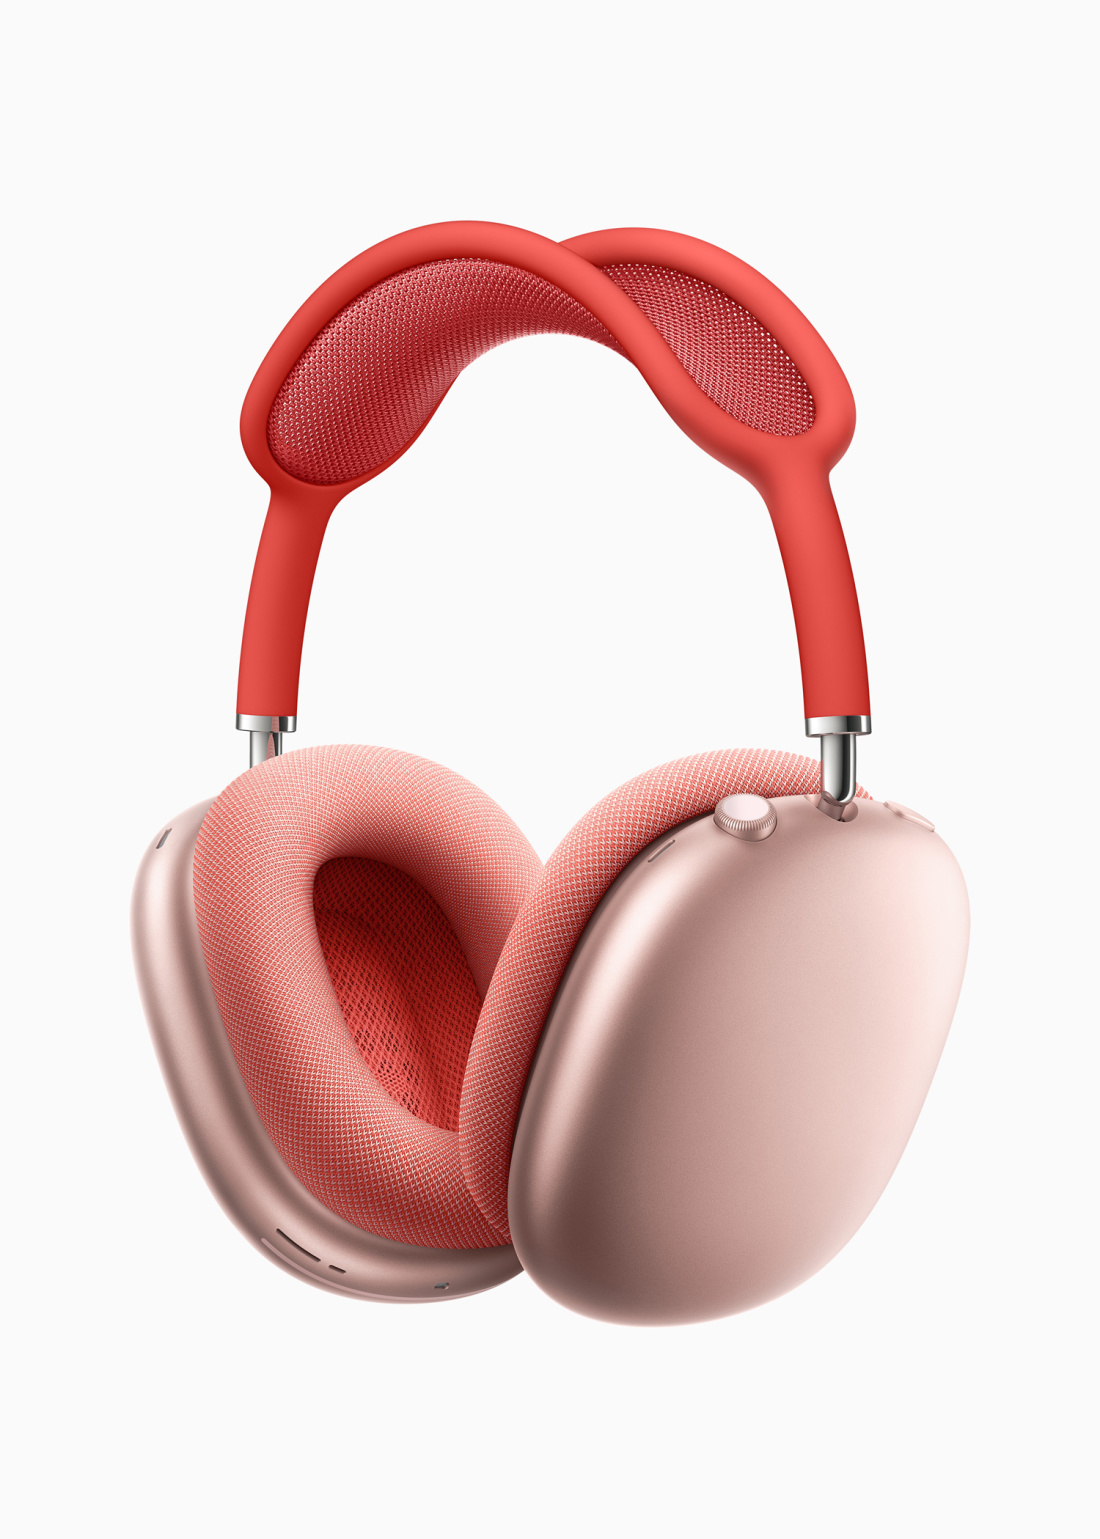 Apple AirPods Max kõrvaklapid